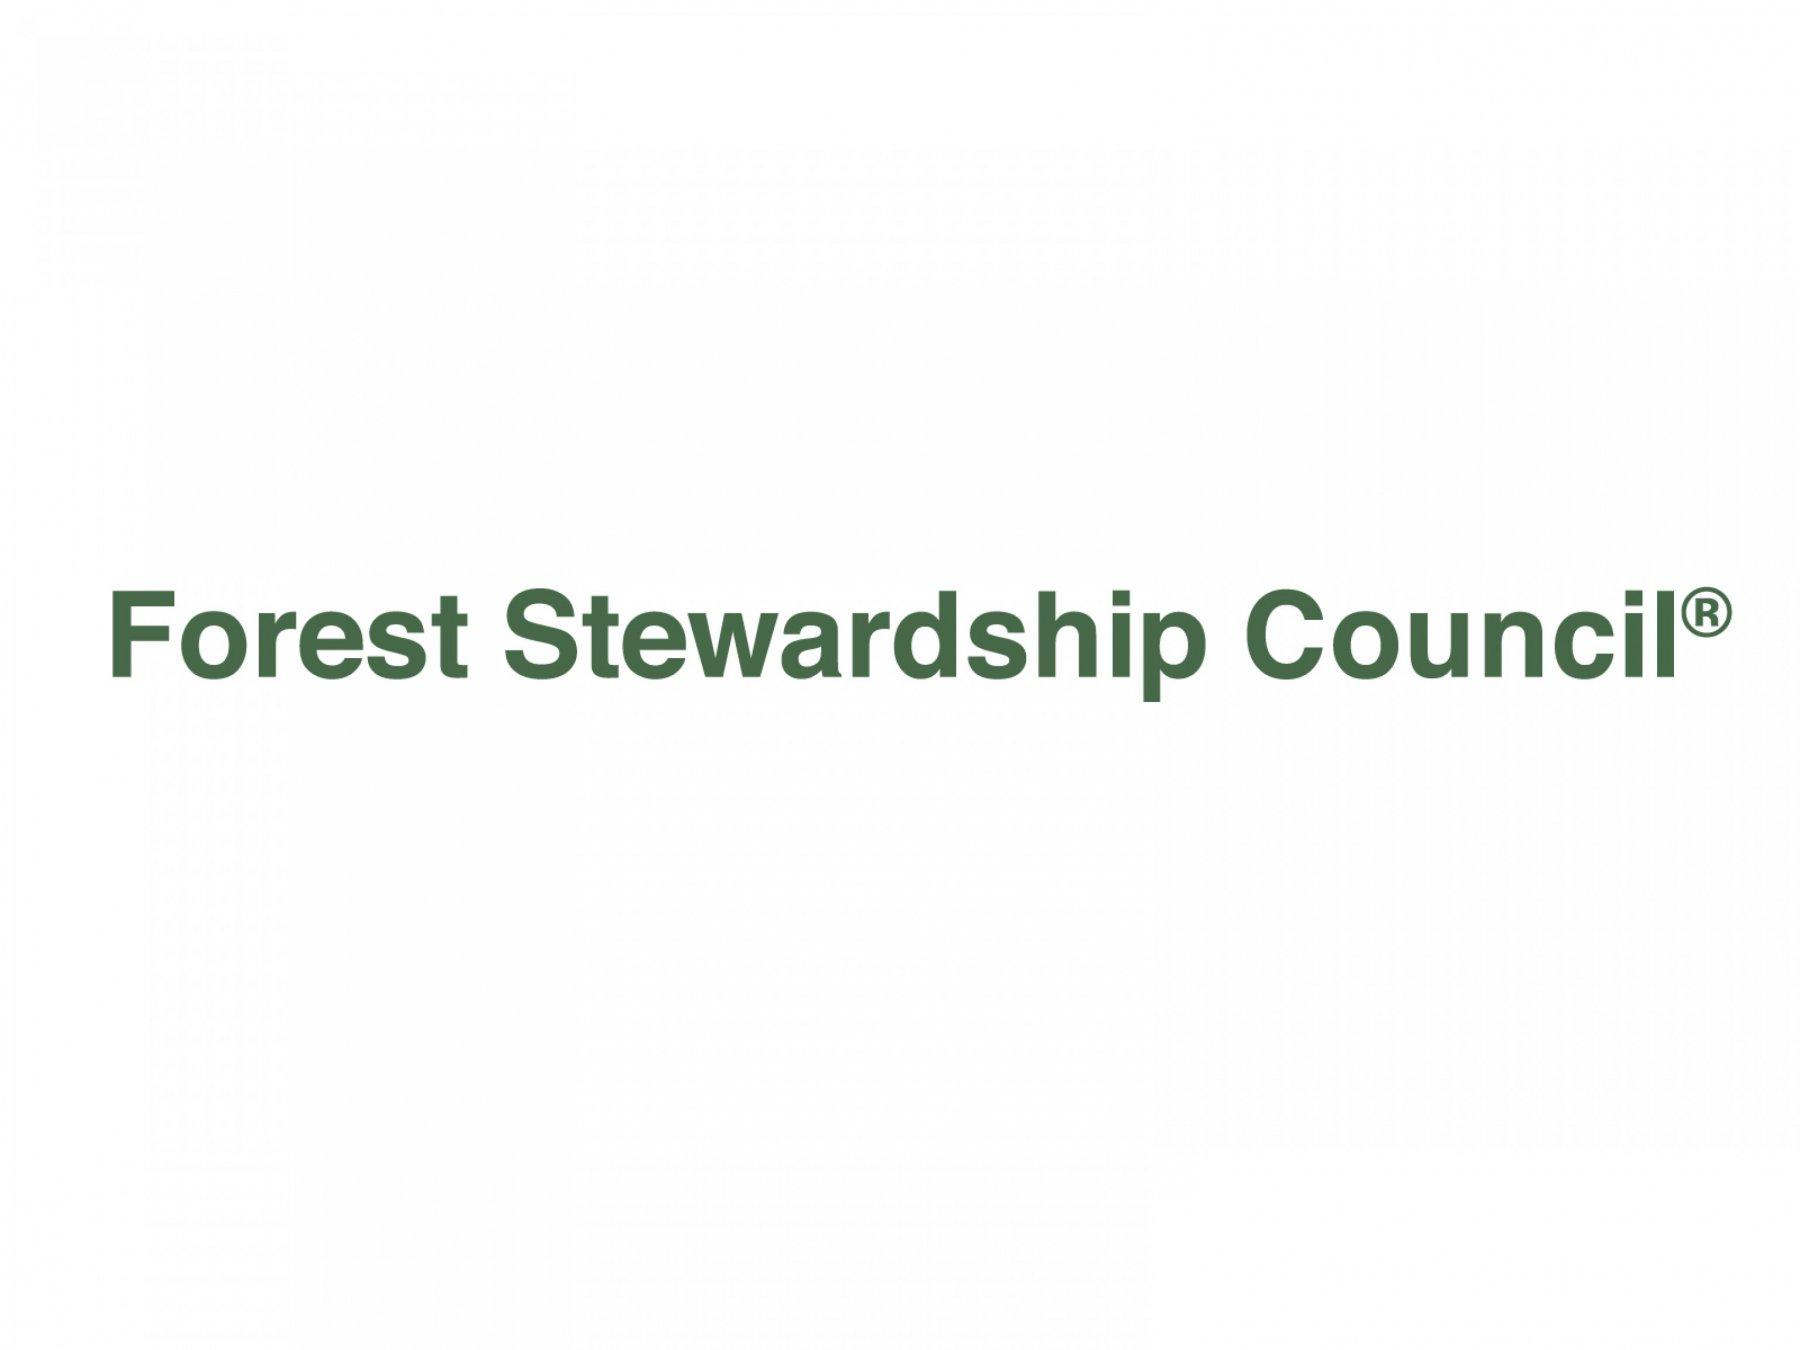 Using fsc trademarks fsc international the name forest stewardship council buycottarizona Choice Image